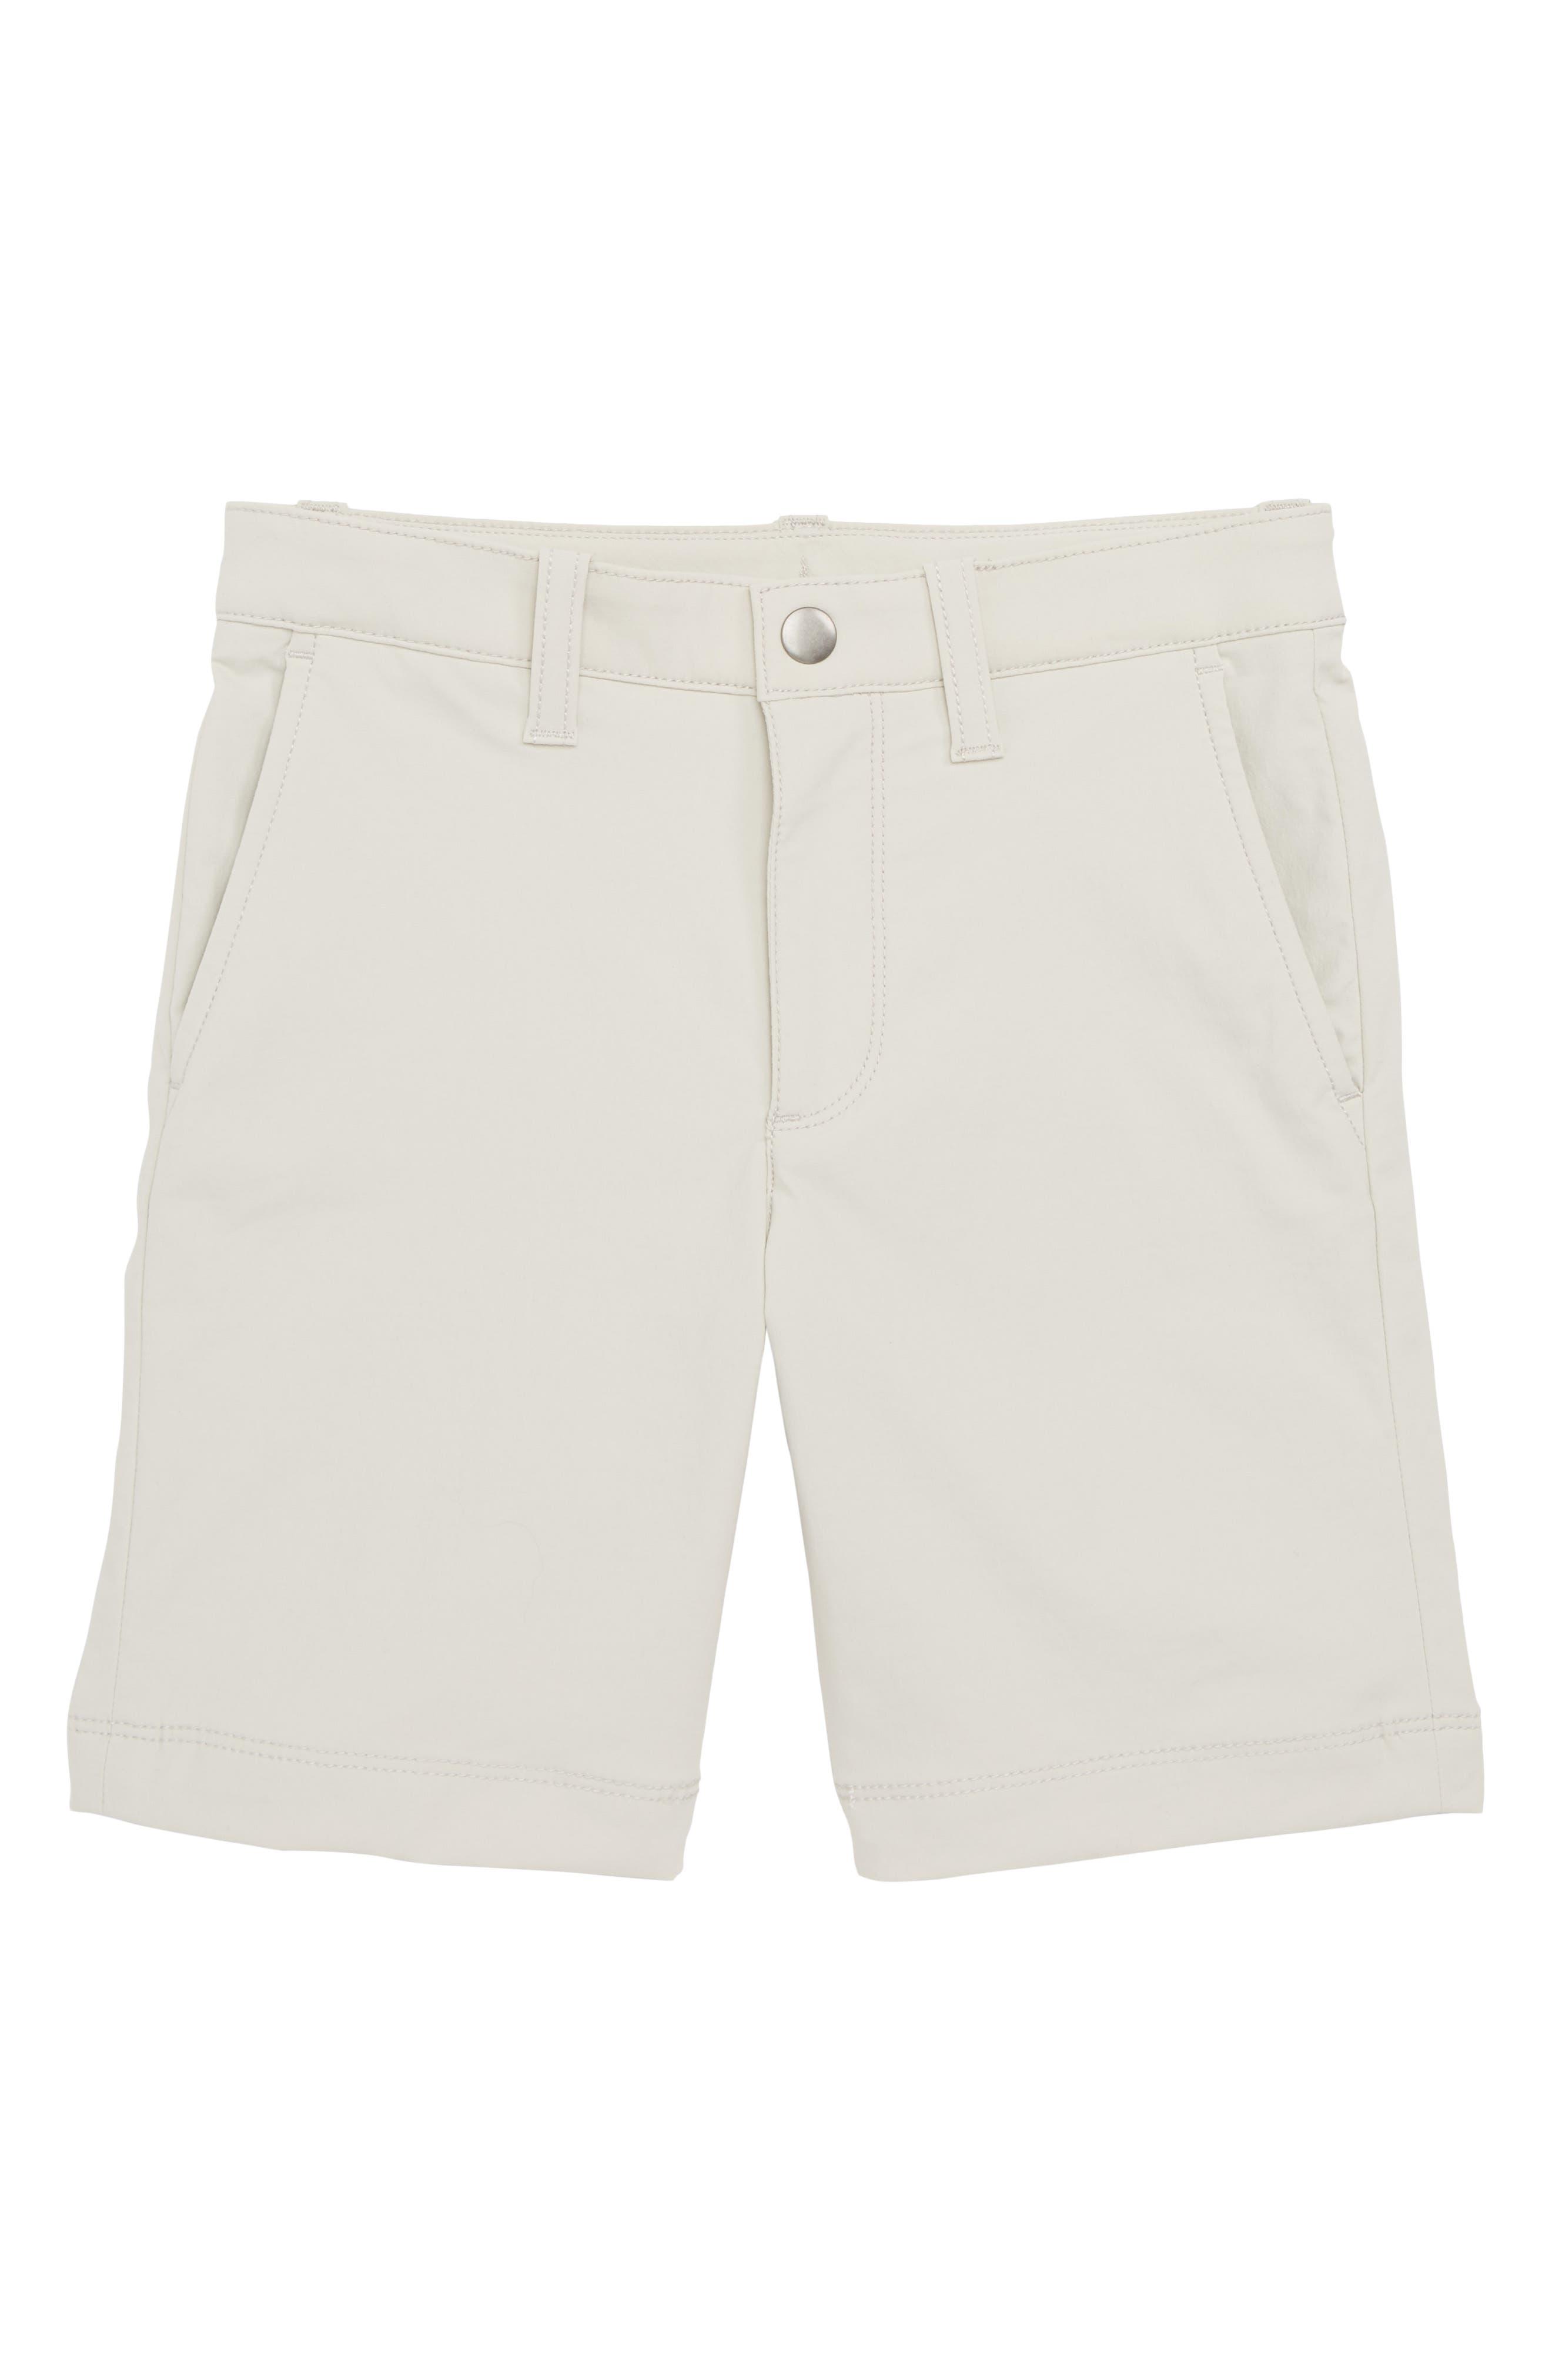 Tech Shorts,                         Main,                         color, 250